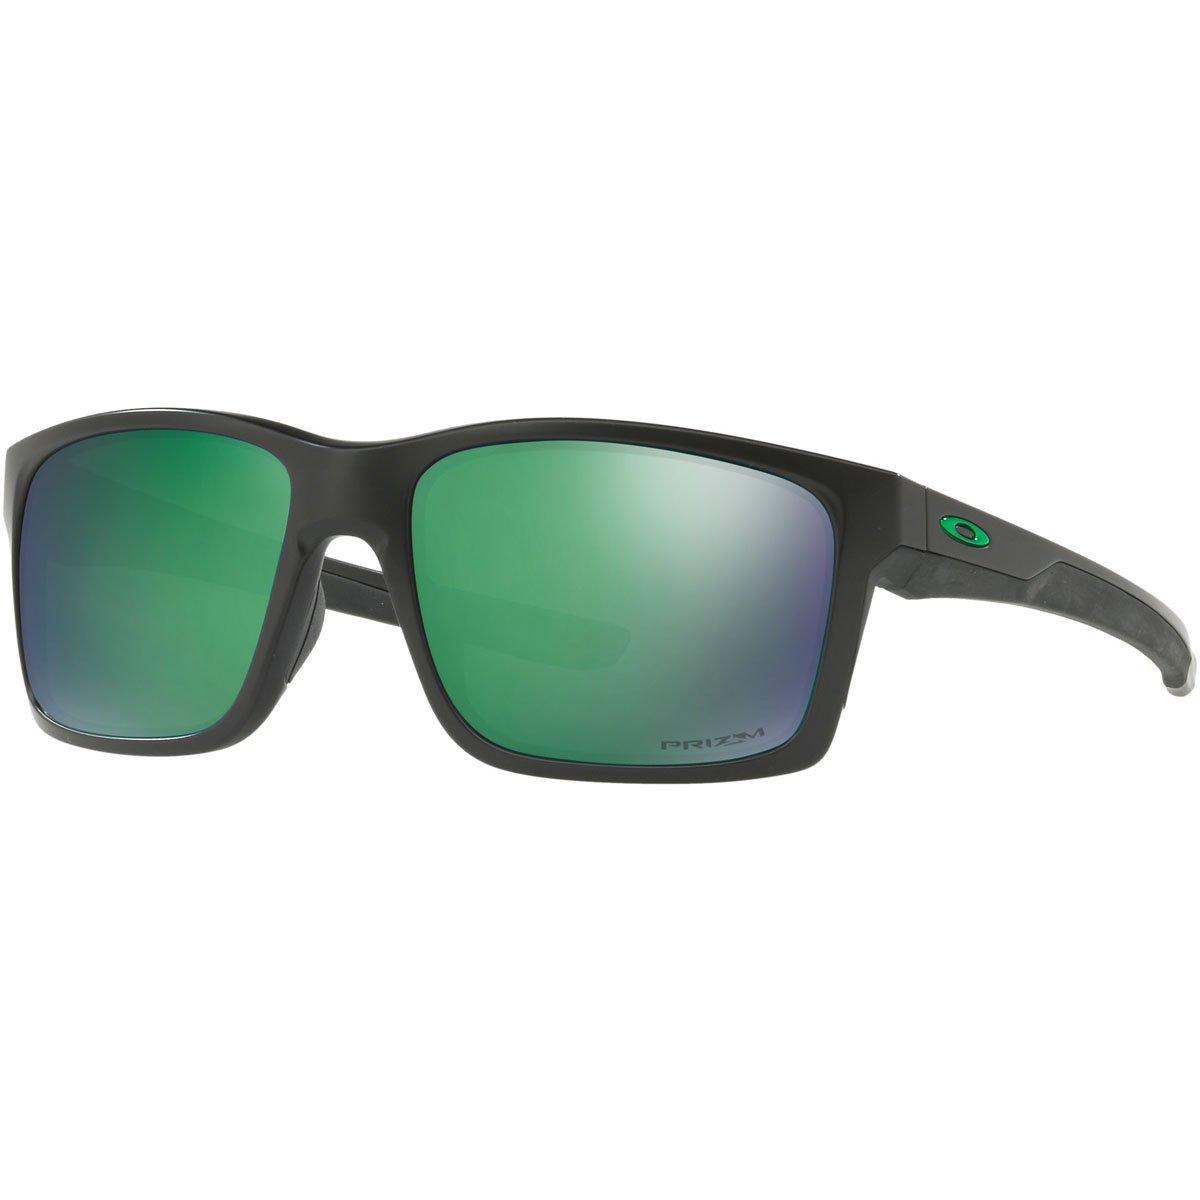 Oakley Mens Mainlink Polarized Sunglasses, Matte Black/Prizm Jade Pol,OS